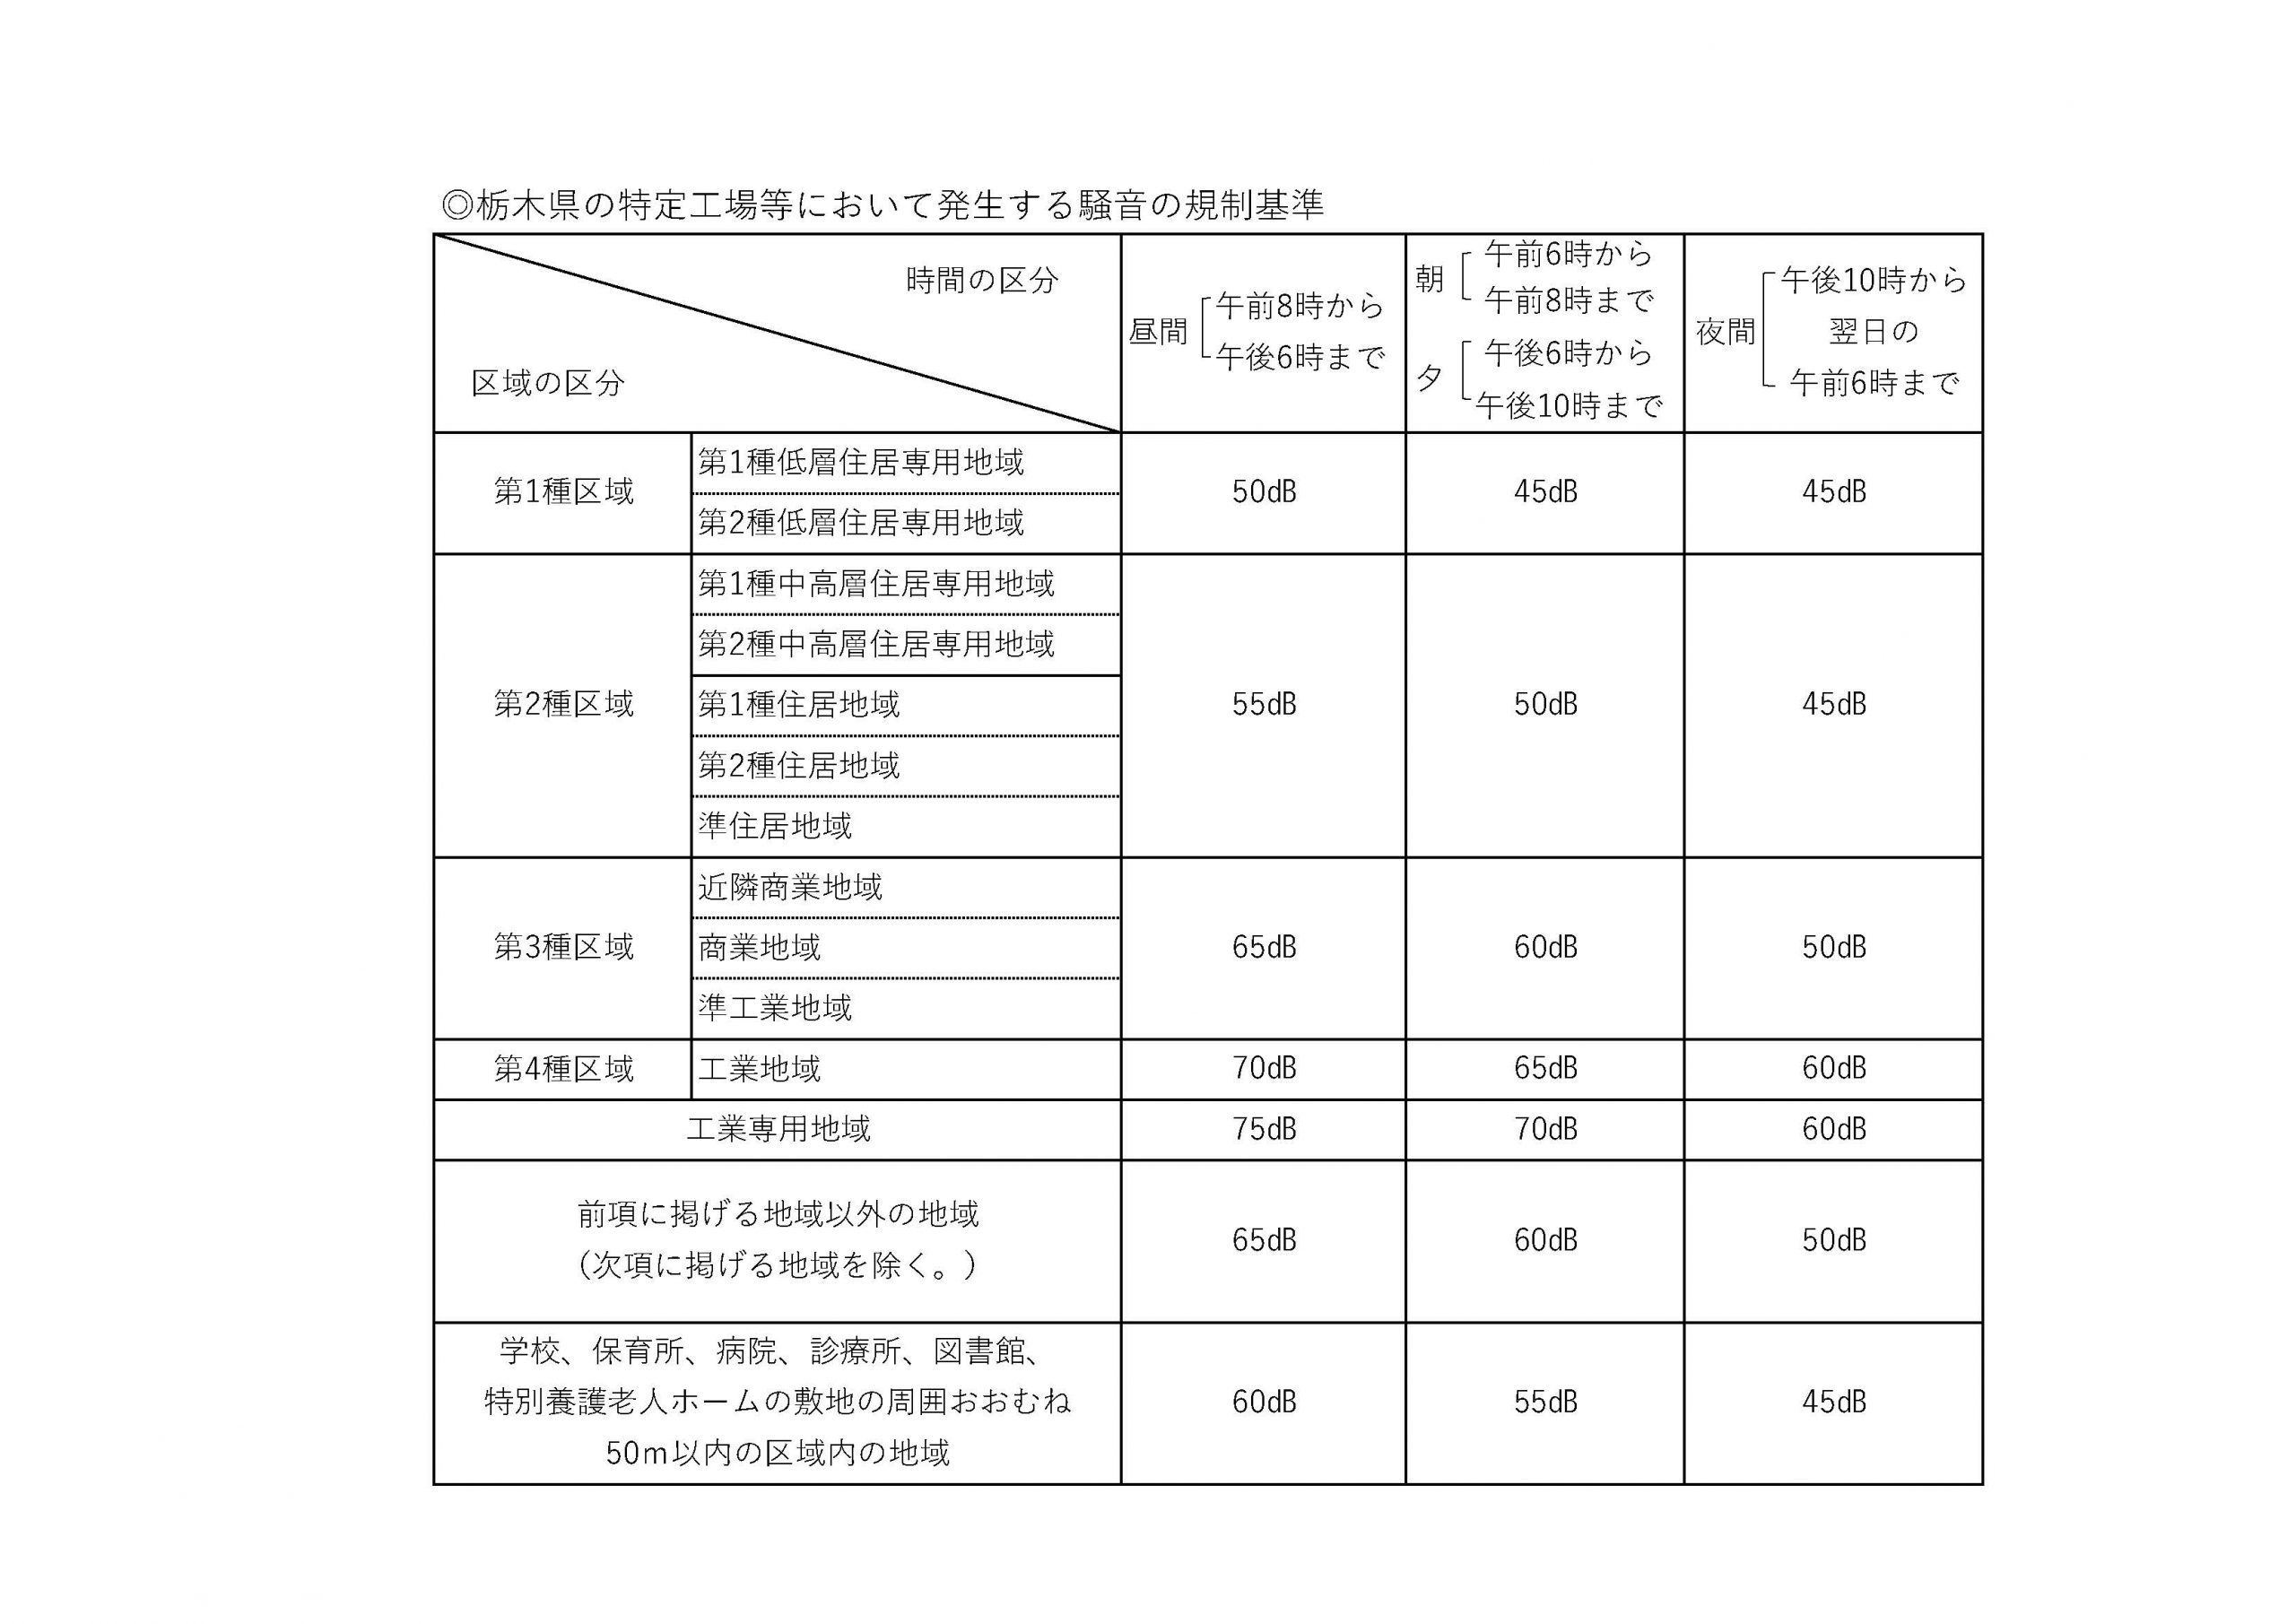 B◎栃木県の特定工場等において発生する騒音の規制基準